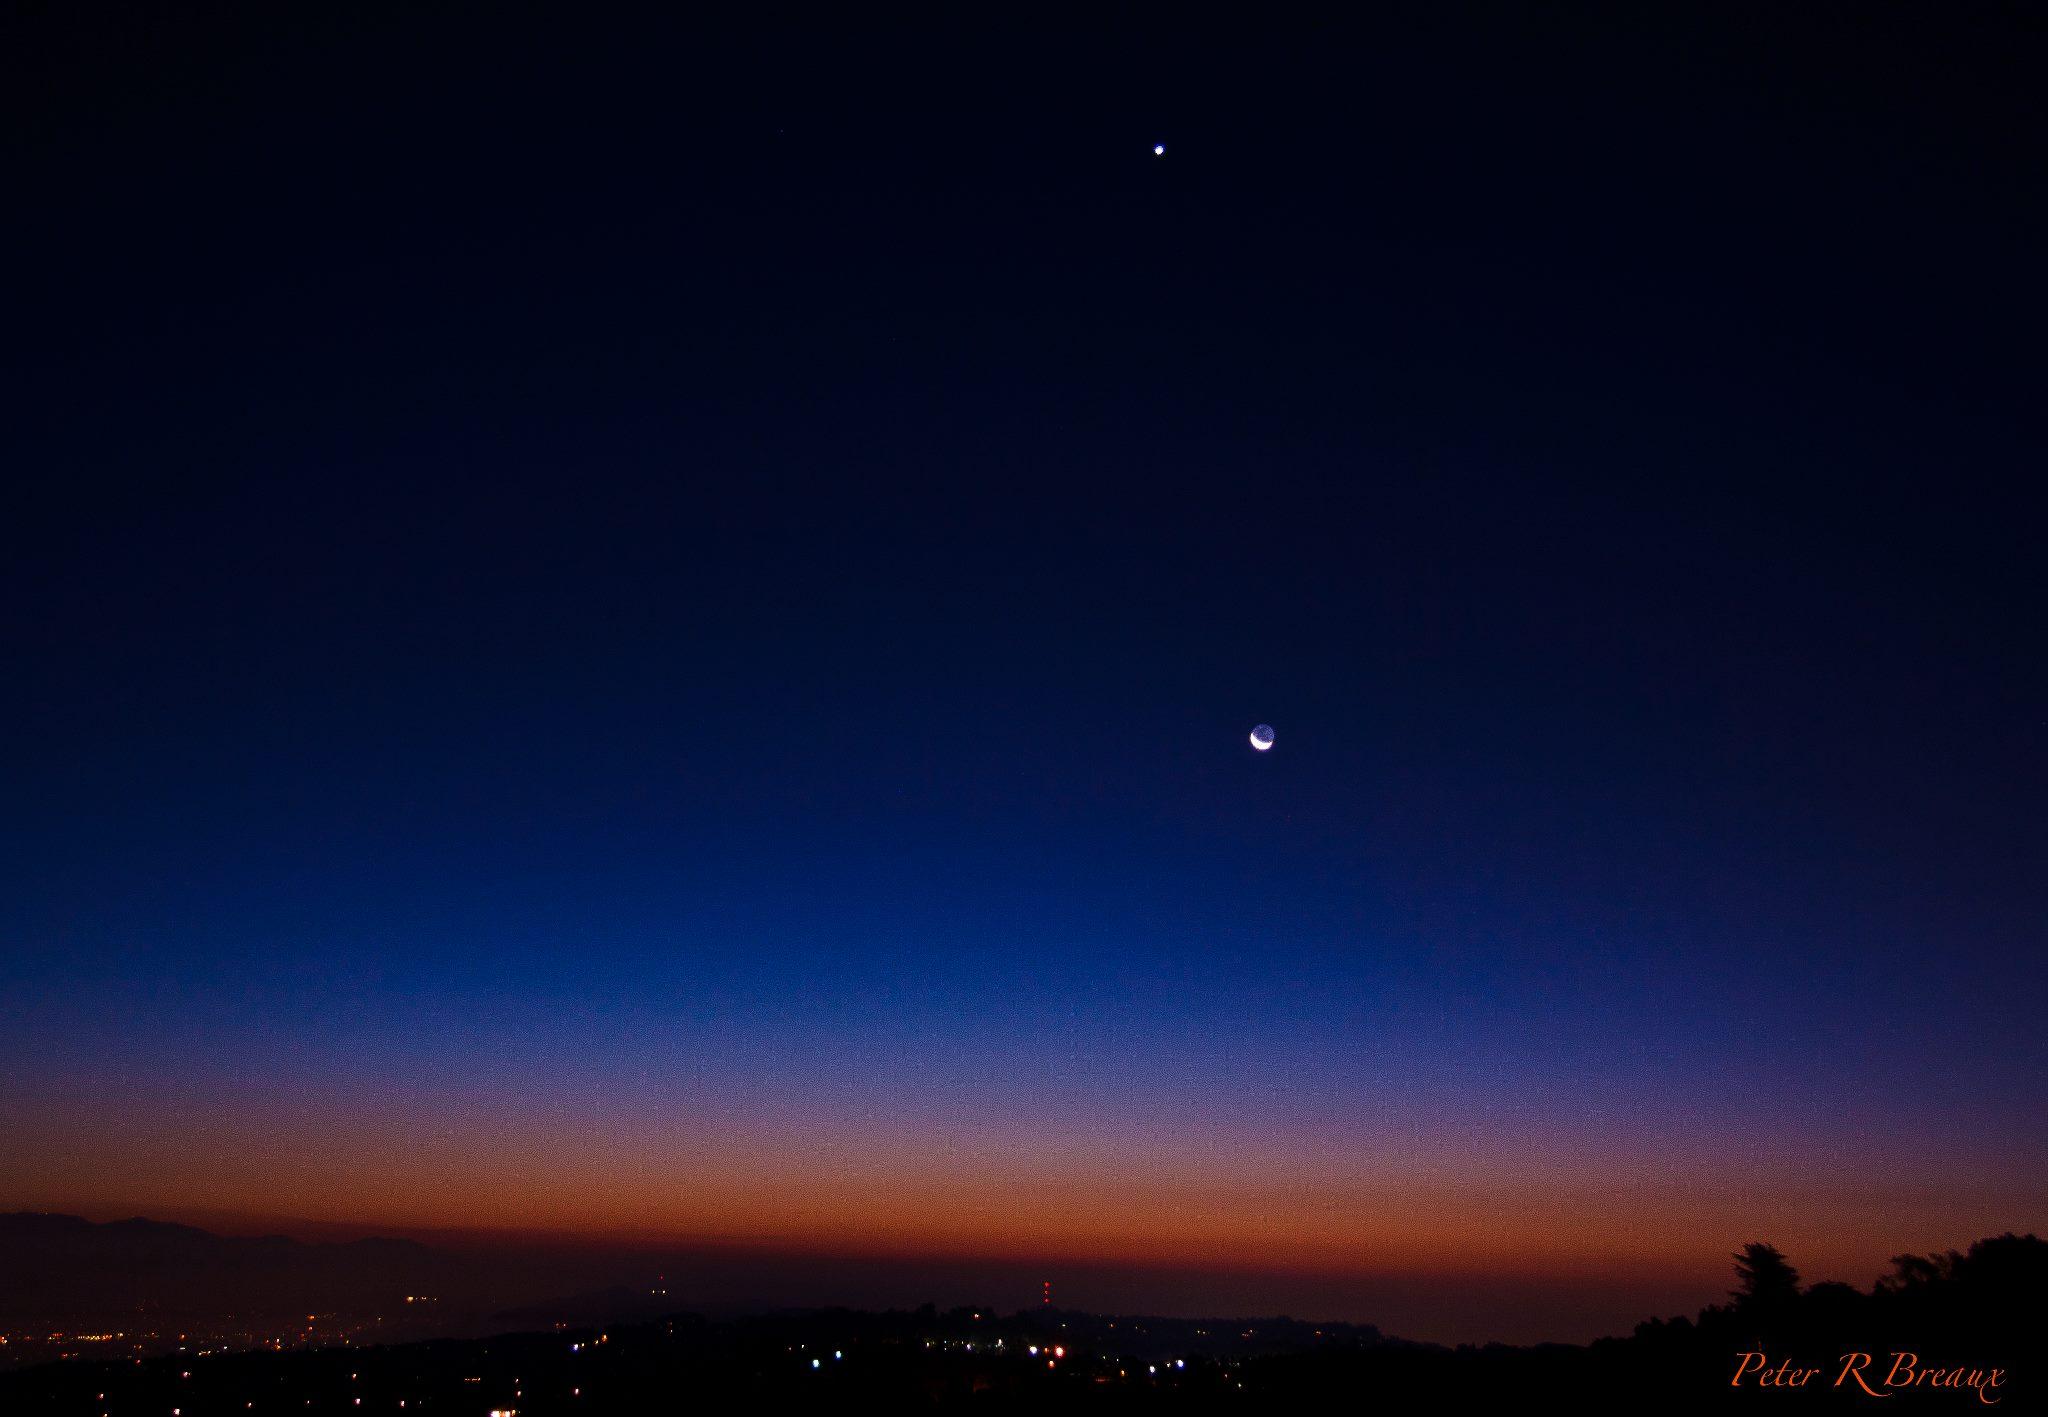 http://en.es-static.us/upl/2012/10/Venus_moon_10-13-2012_Los-Angeles_Peter_Rodney_Breaux.jpeg